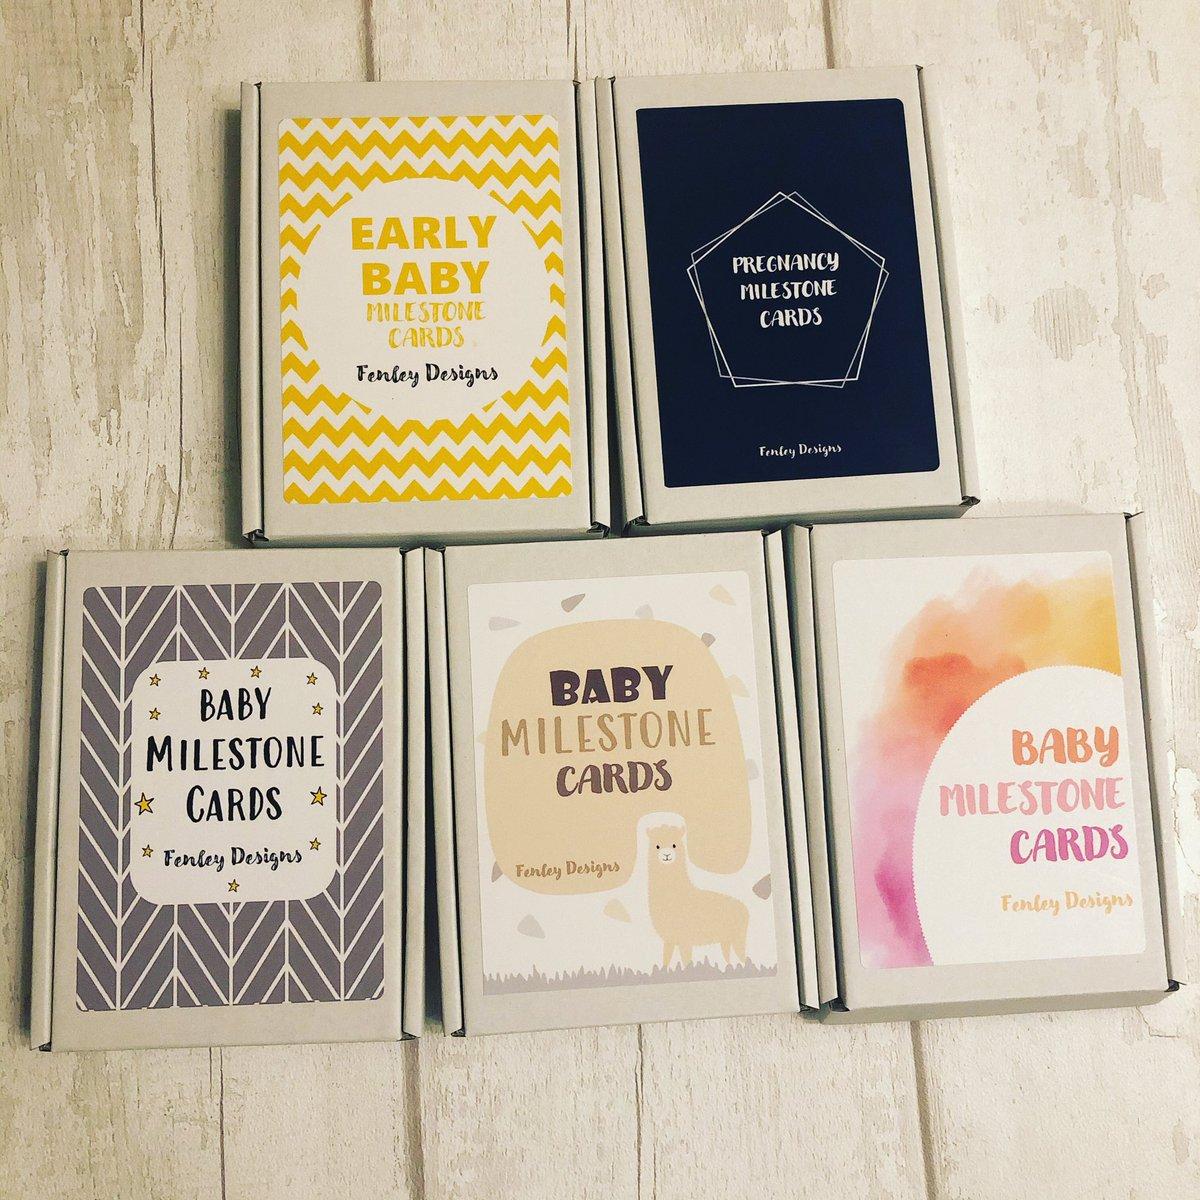 Today's orders are ready to go! 😍   #Milestonecards #etsy #smallbusiness #smallbusinessuk #ivf #pregnancy #baby #prematurebaby #rainbowbaby